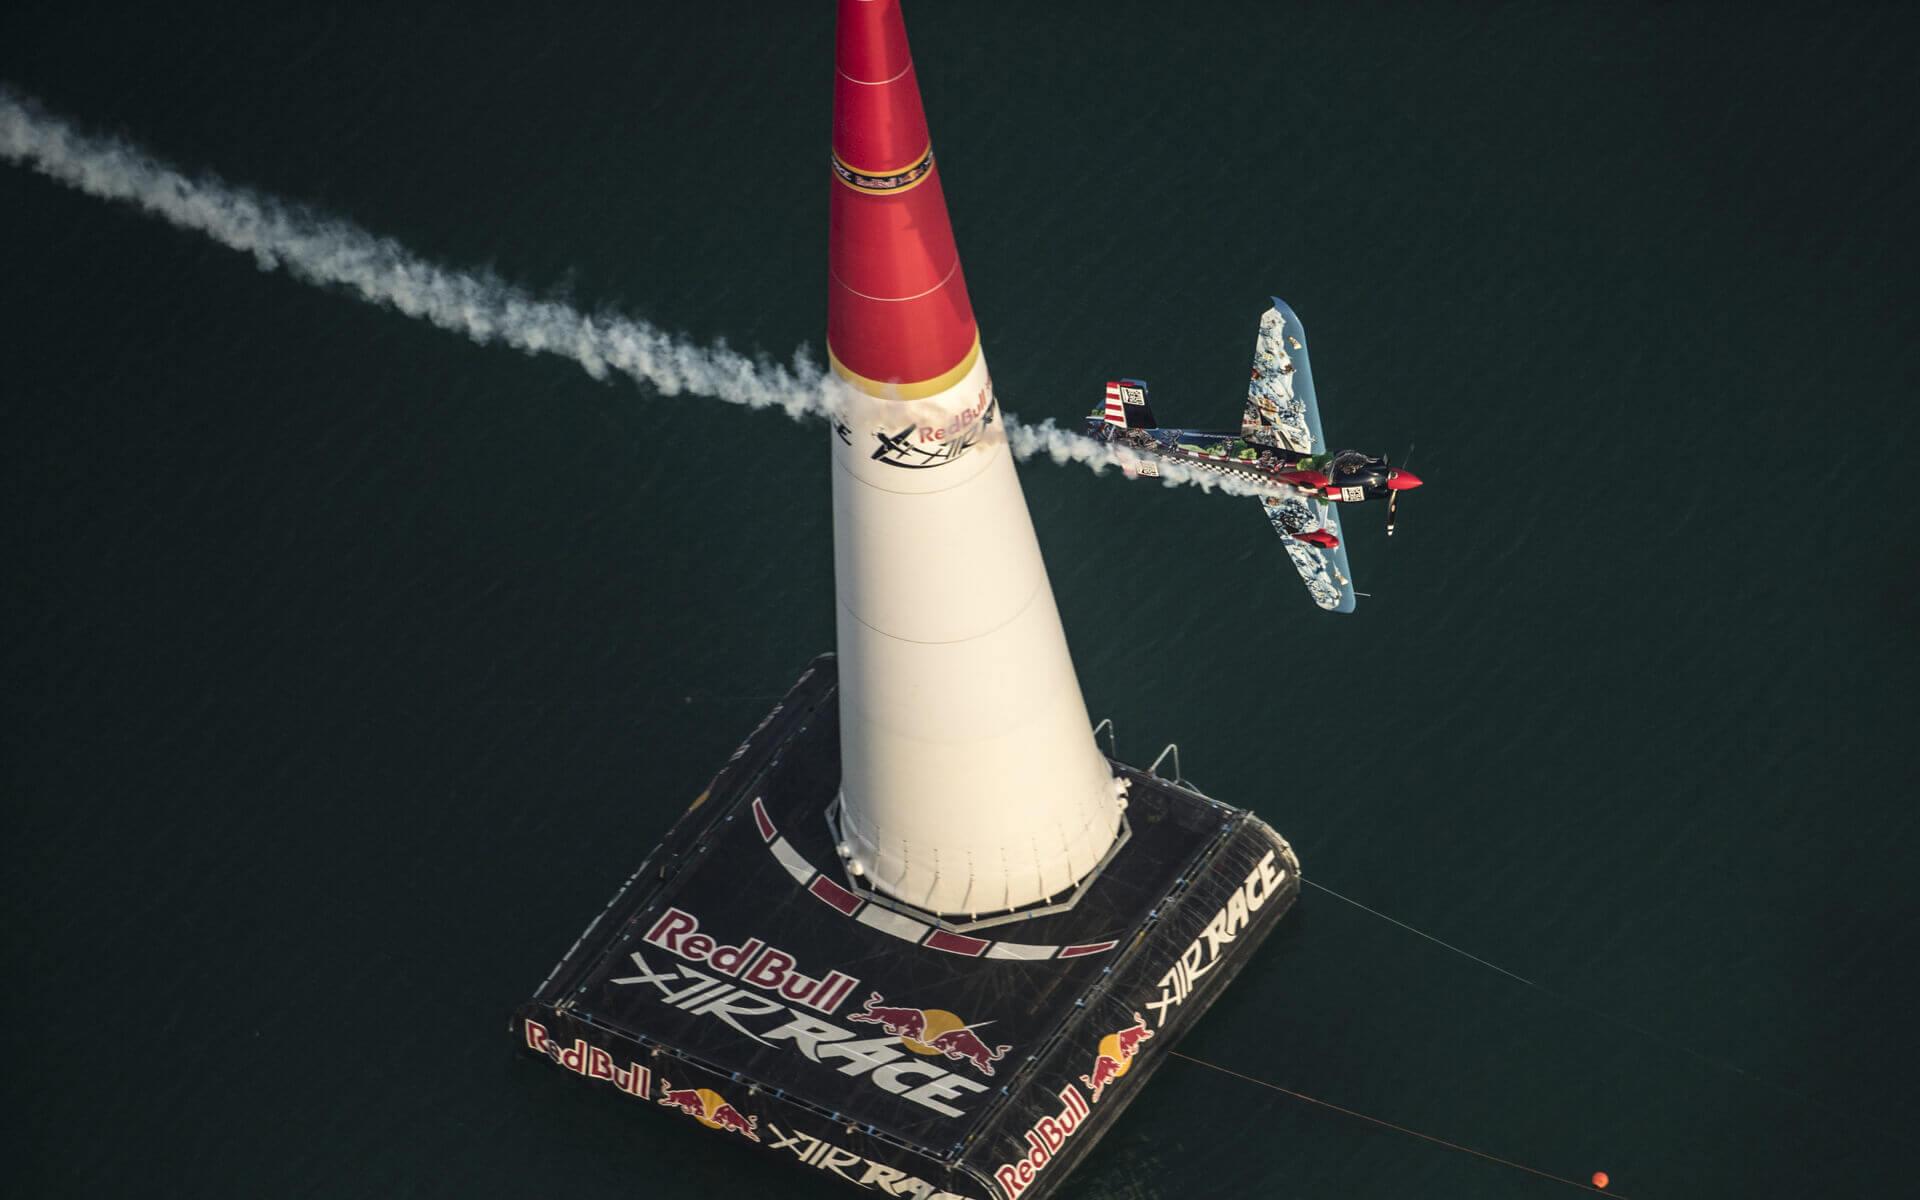 Martin Šonka a Petr Kopfstein poměří síly v air race na Aviatické pouti